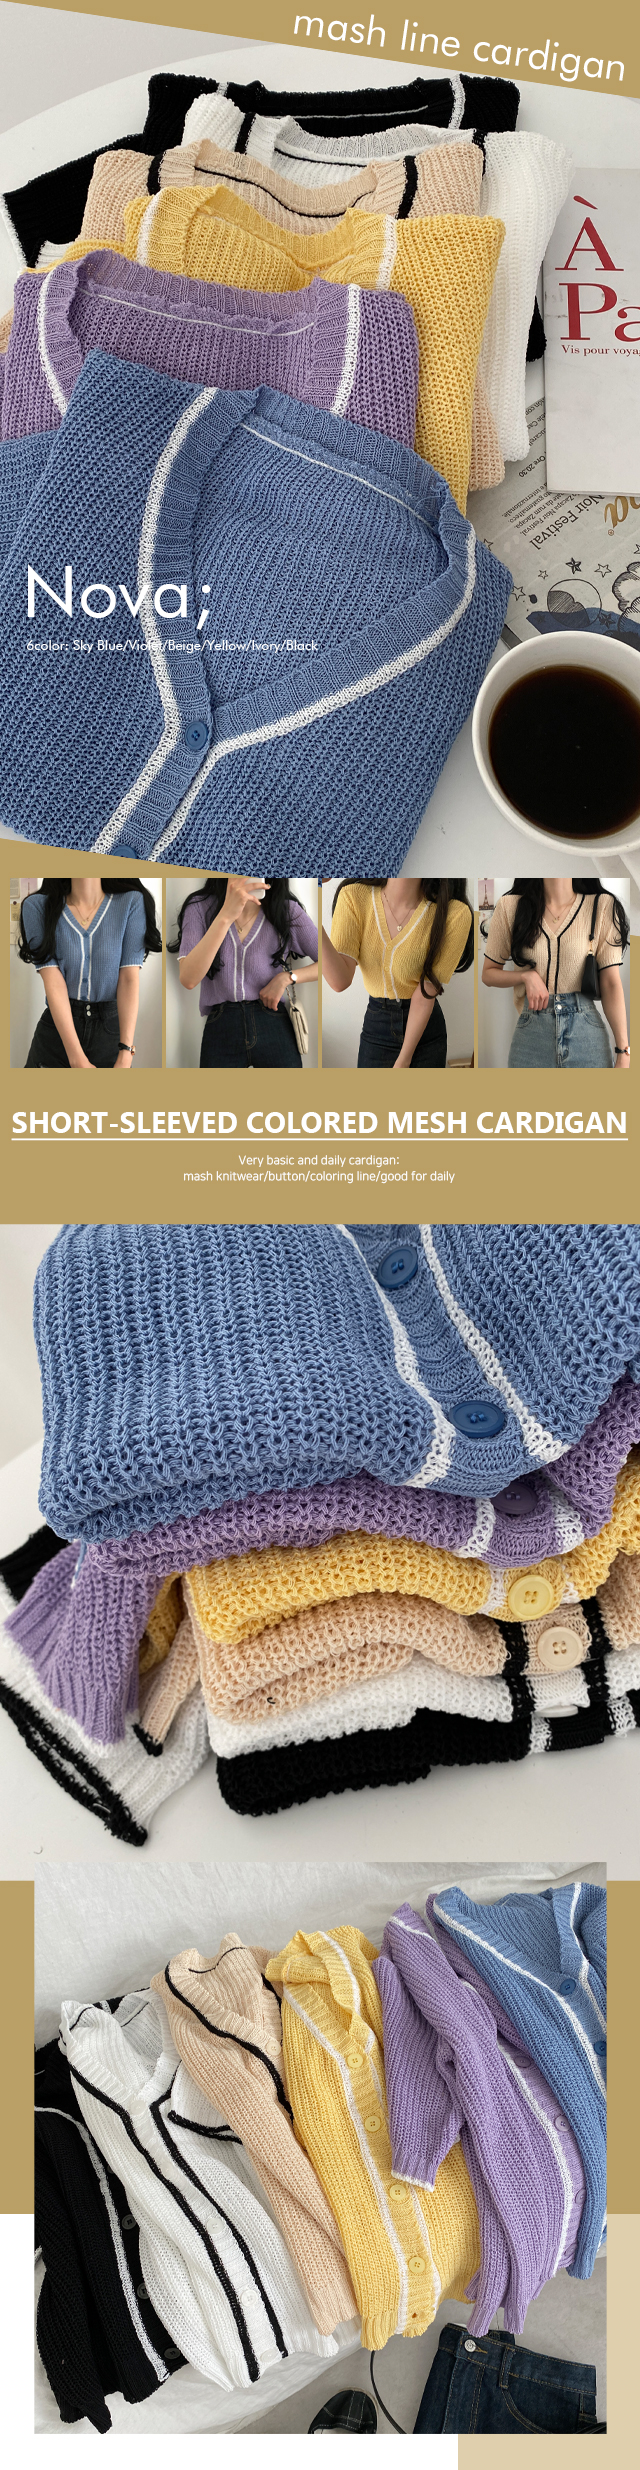 Nova color short sleeve cardigan